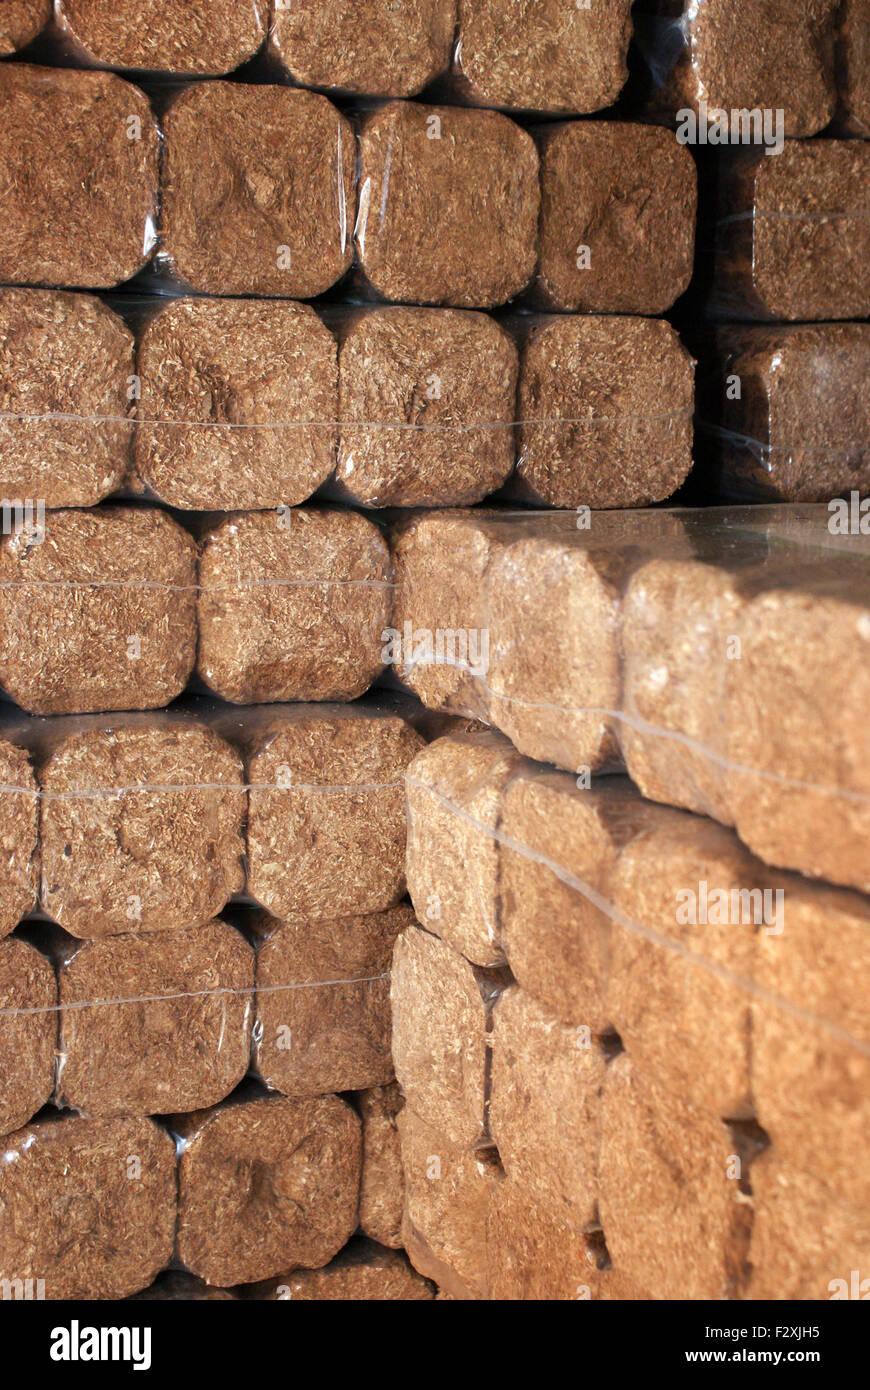 Hard wood briks for heating - Stock Image